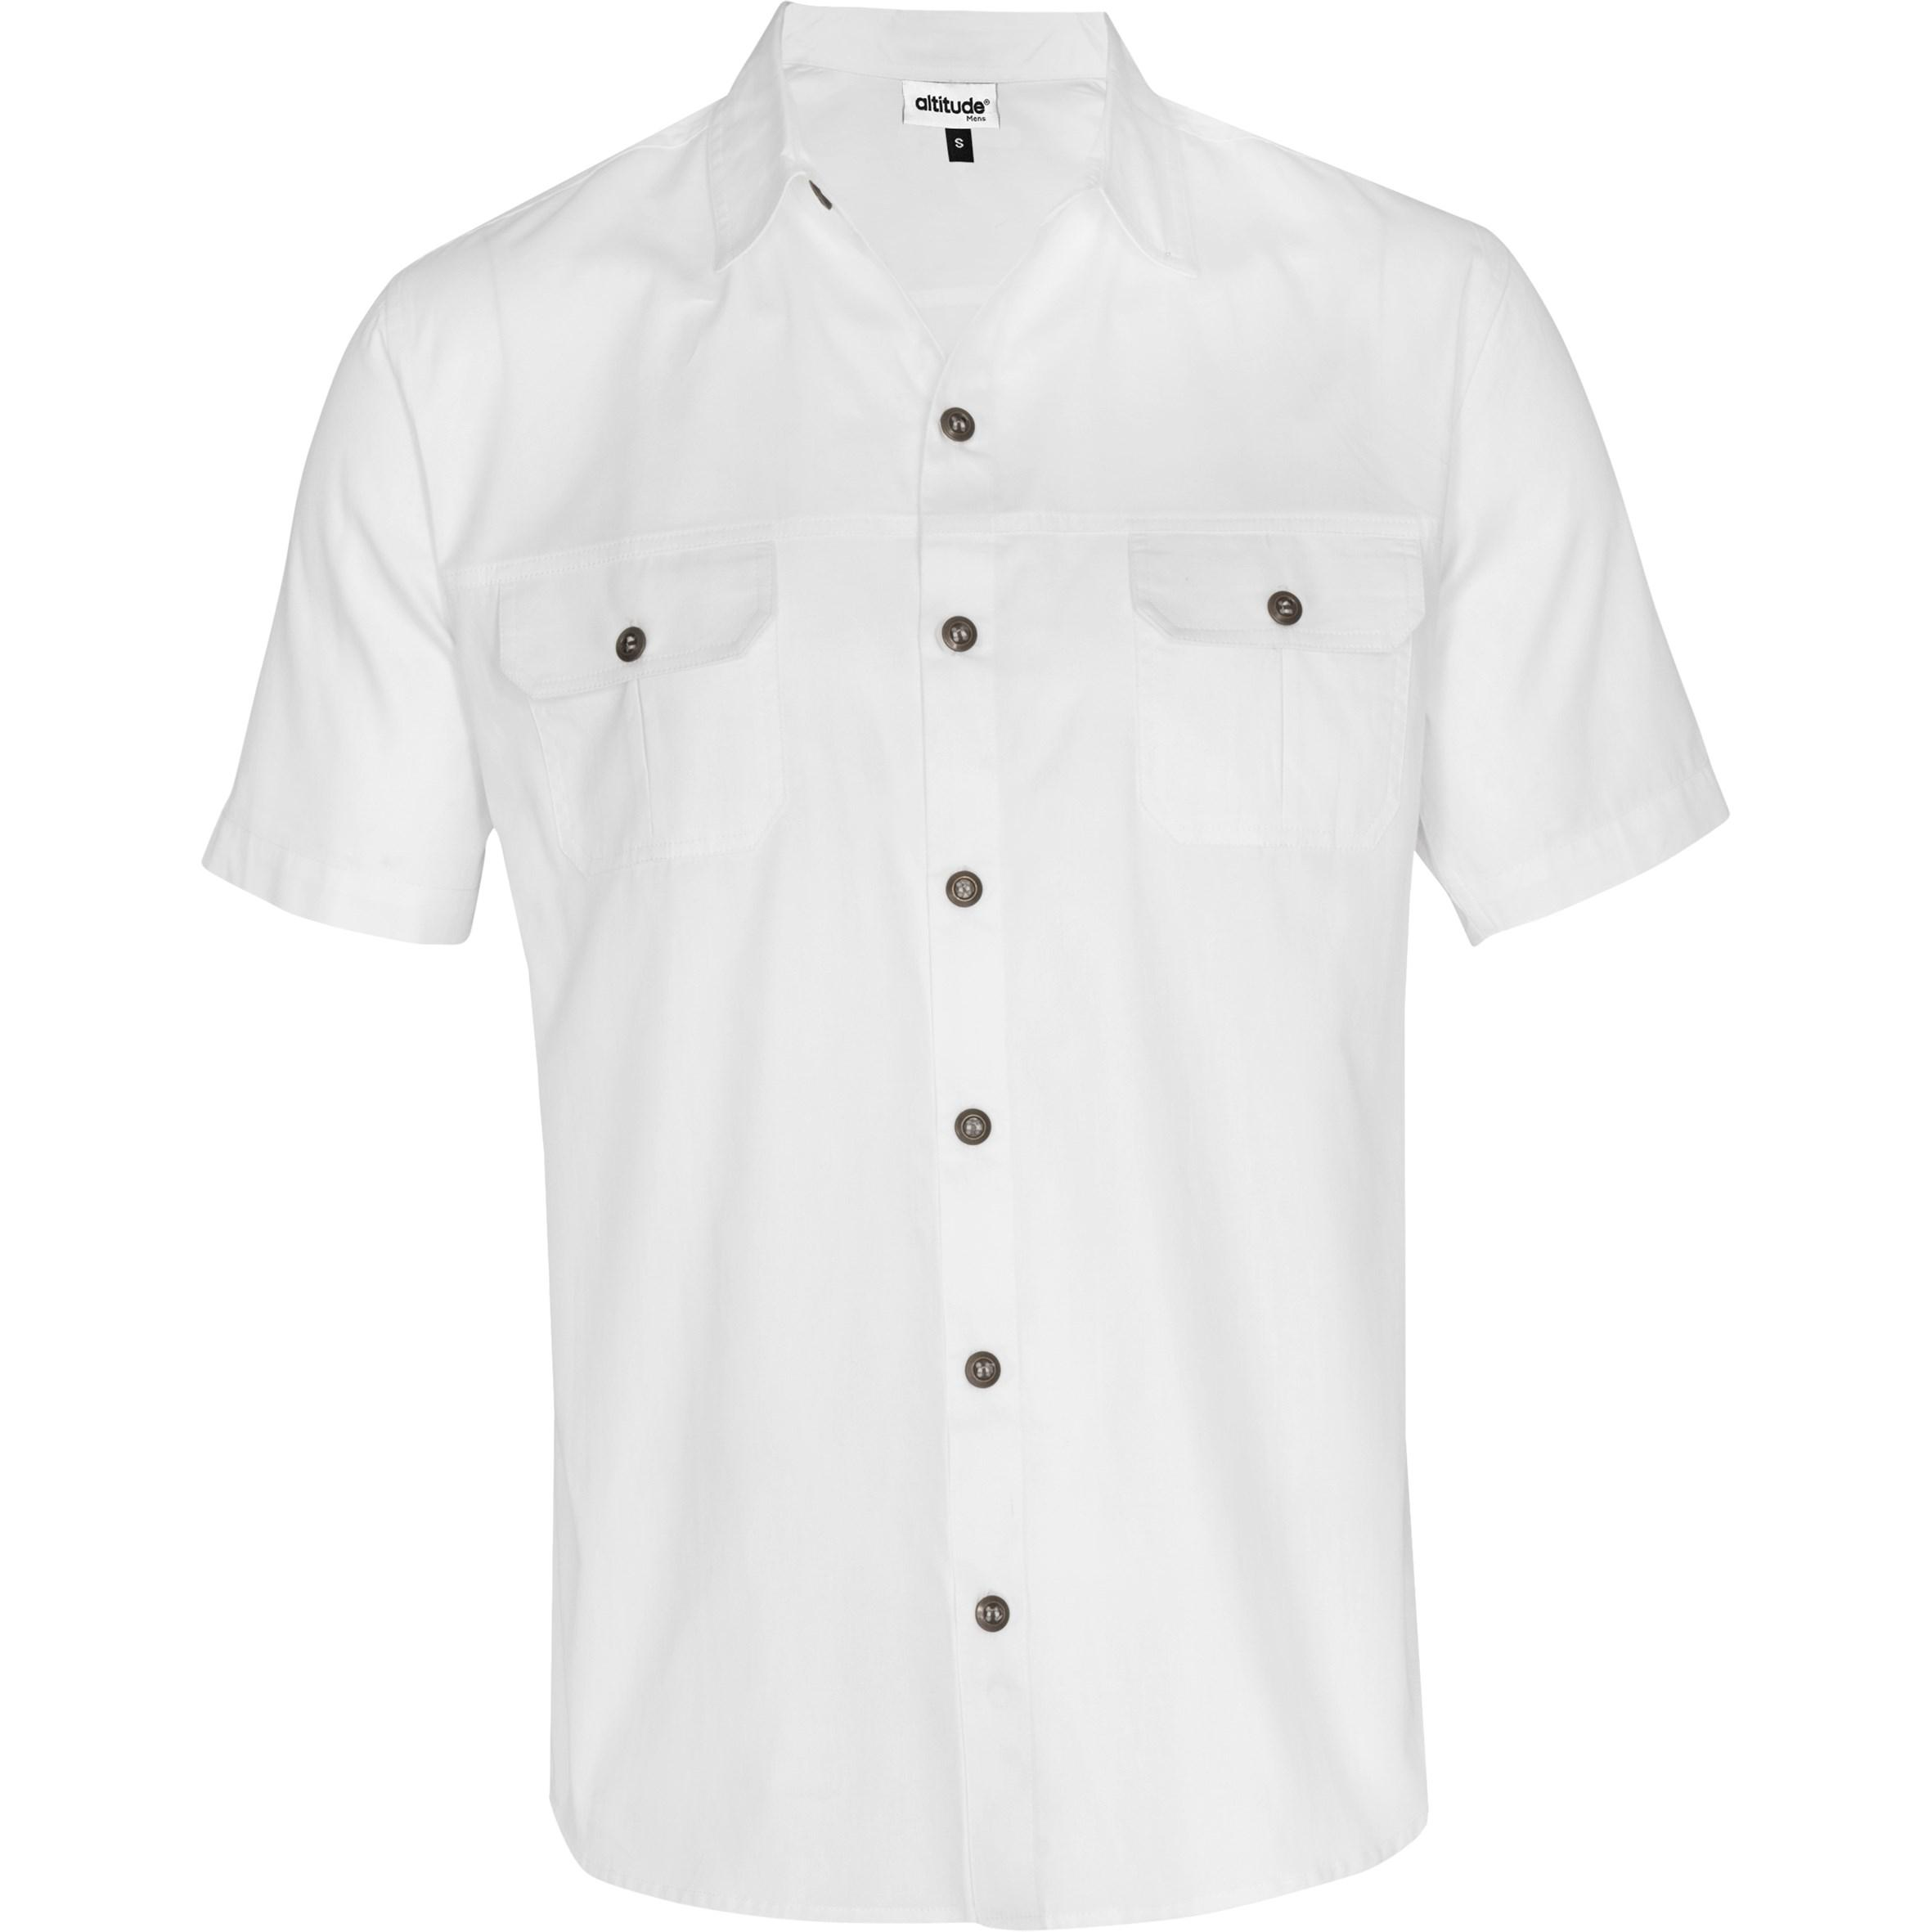 Mens Short Sleeve Oryx Bush Shirt -white Only